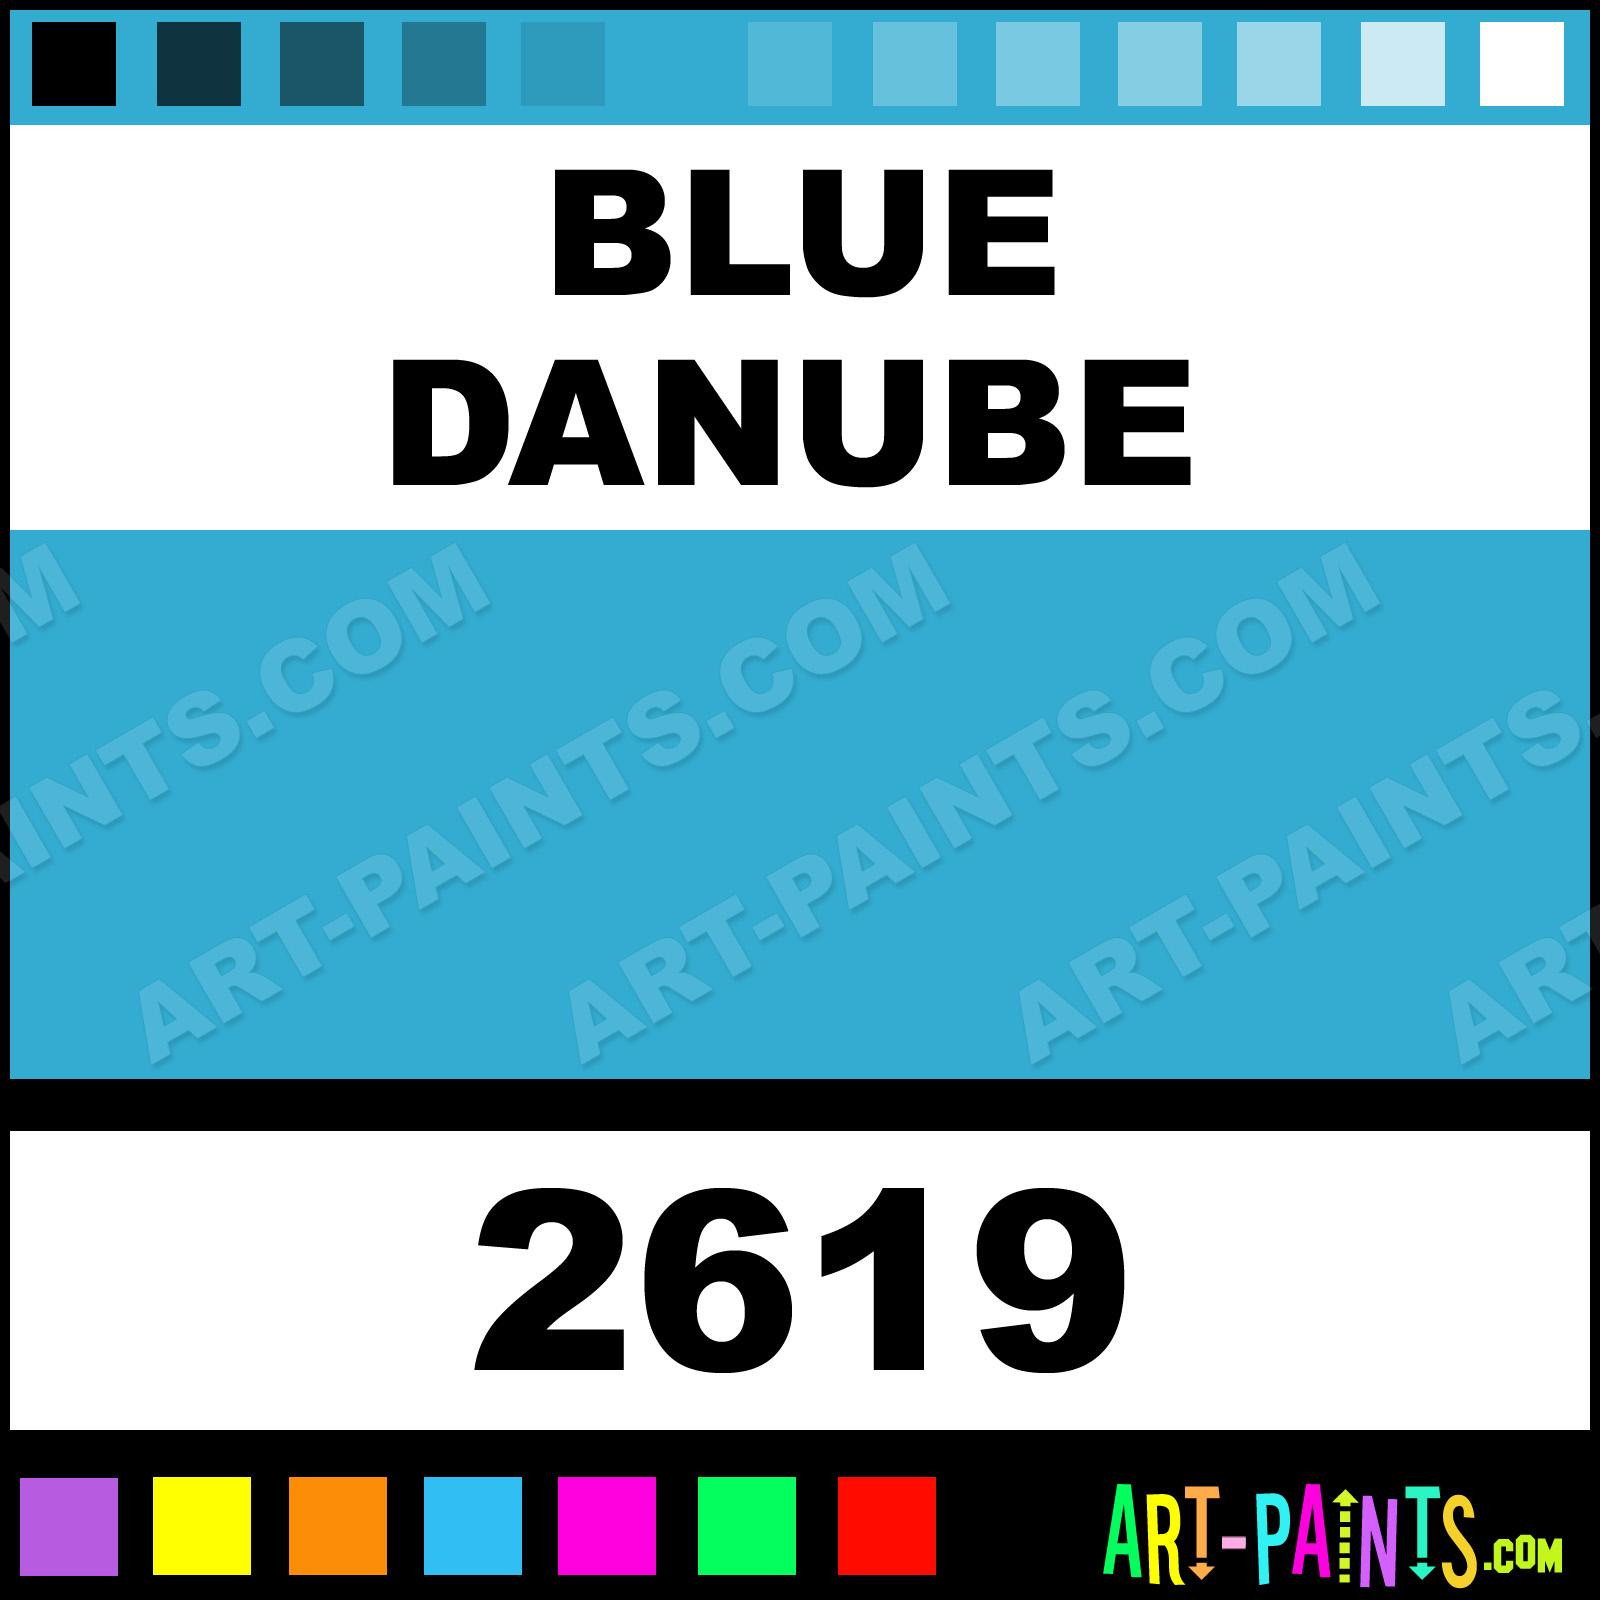 blue danube h2o latex spray paints 2619 blue danube. Black Bedroom Furniture Sets. Home Design Ideas